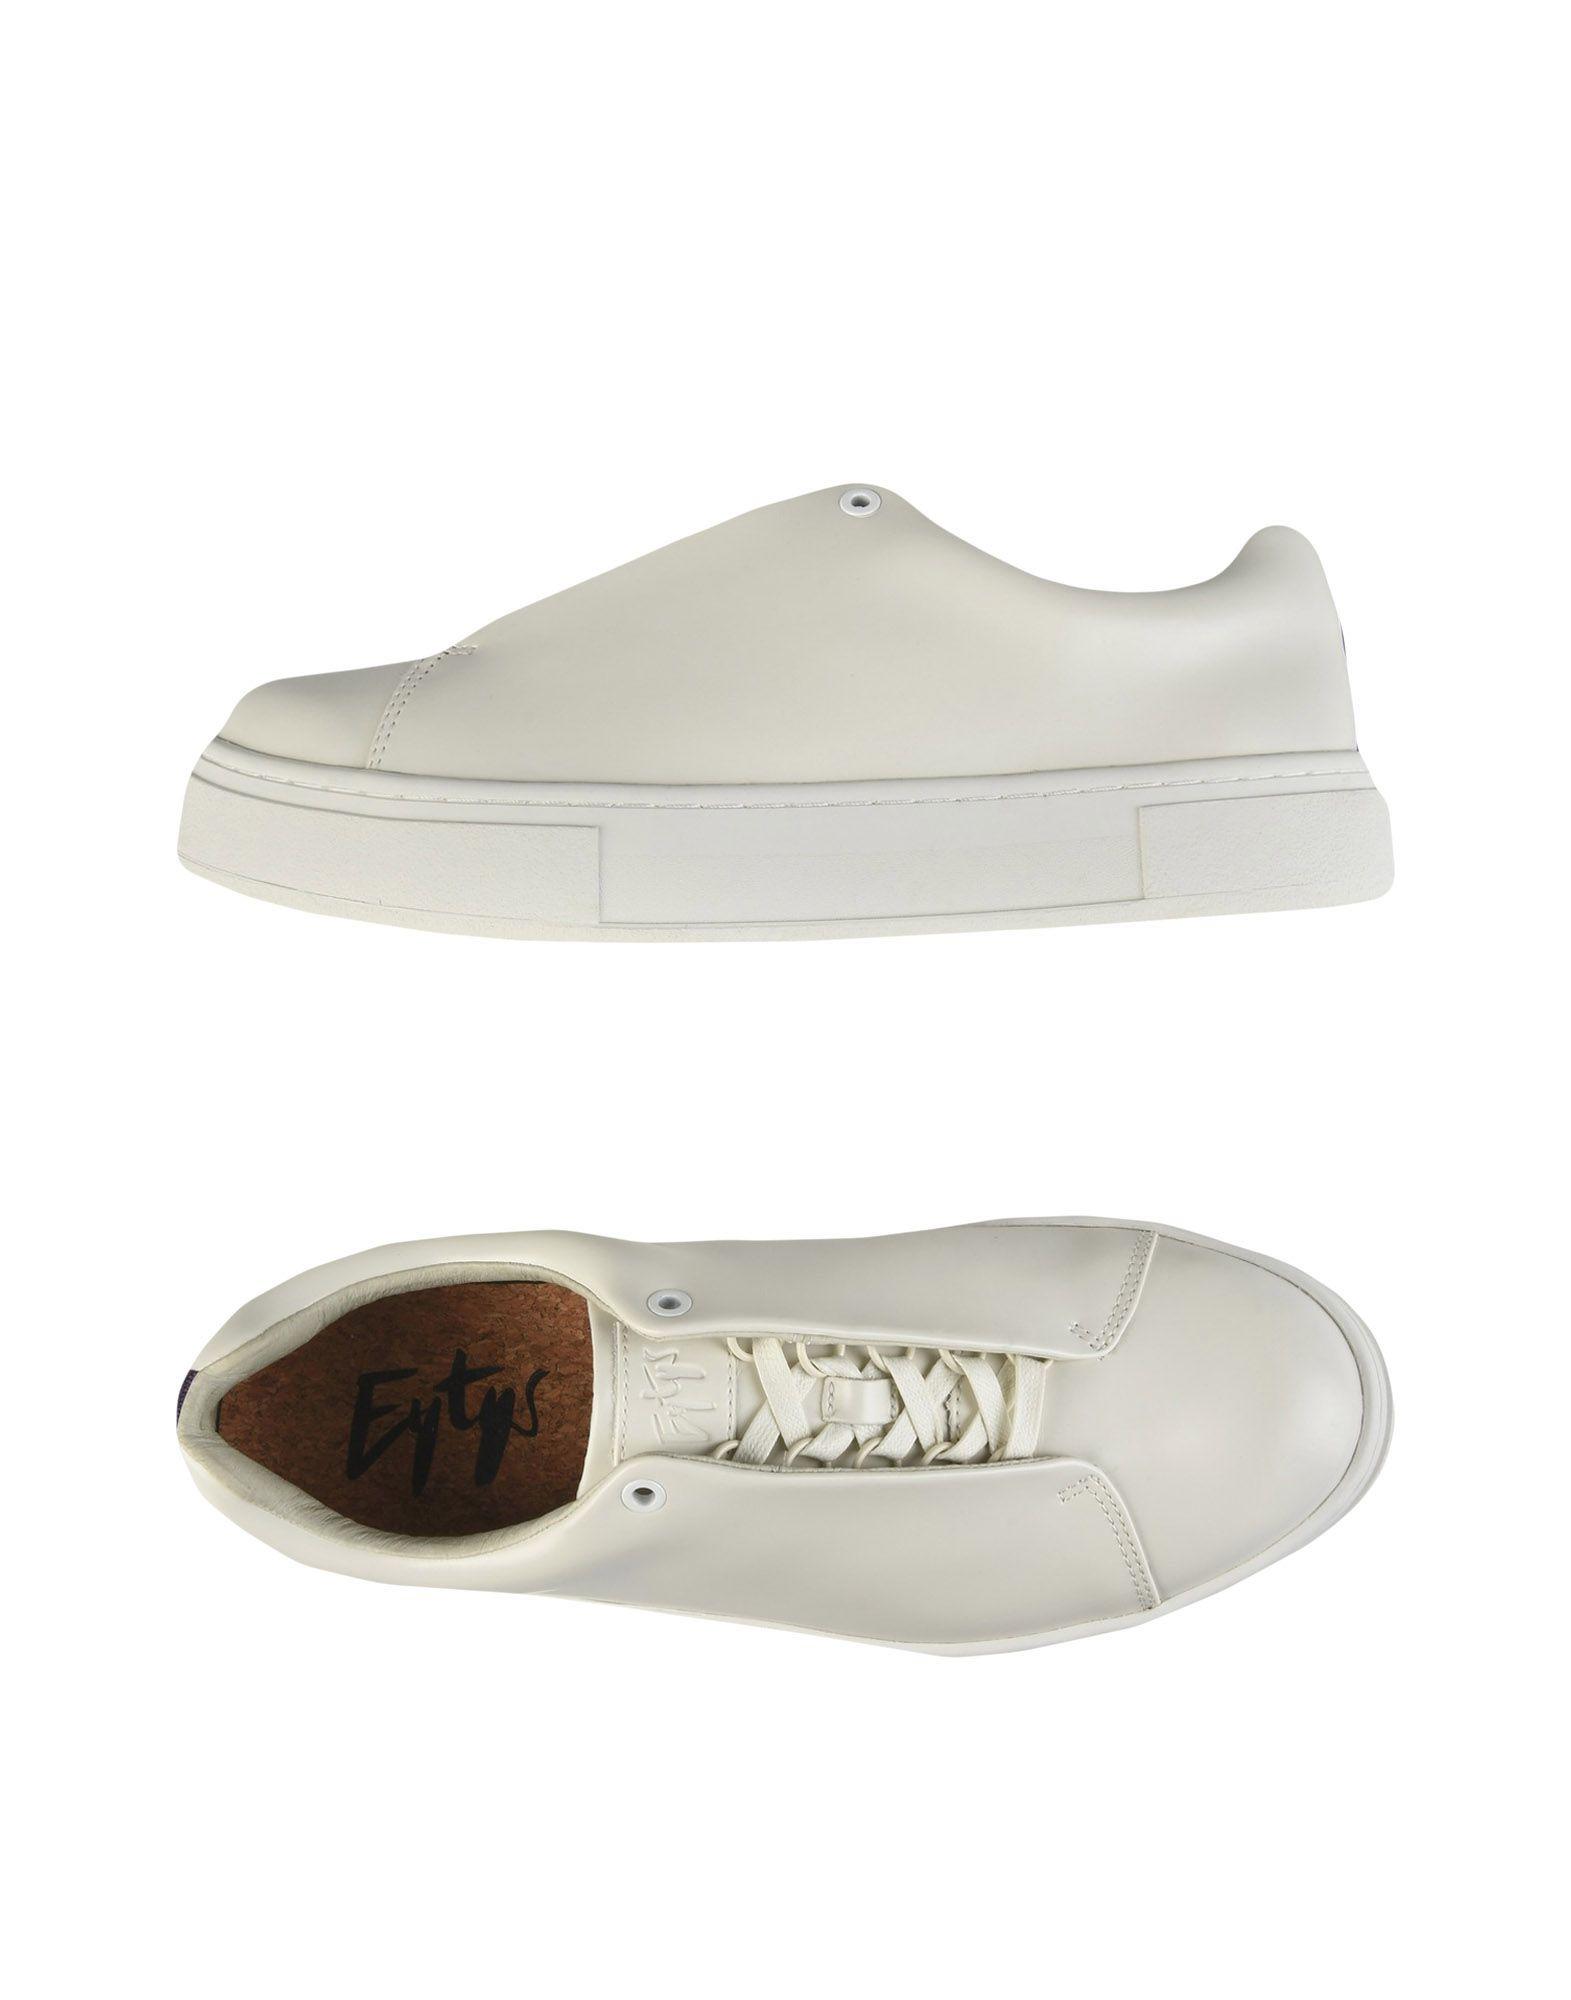 Eytys Doja Leather beliebte  11248628KJ Gute Qualität beliebte Leather Schuhe 704f33